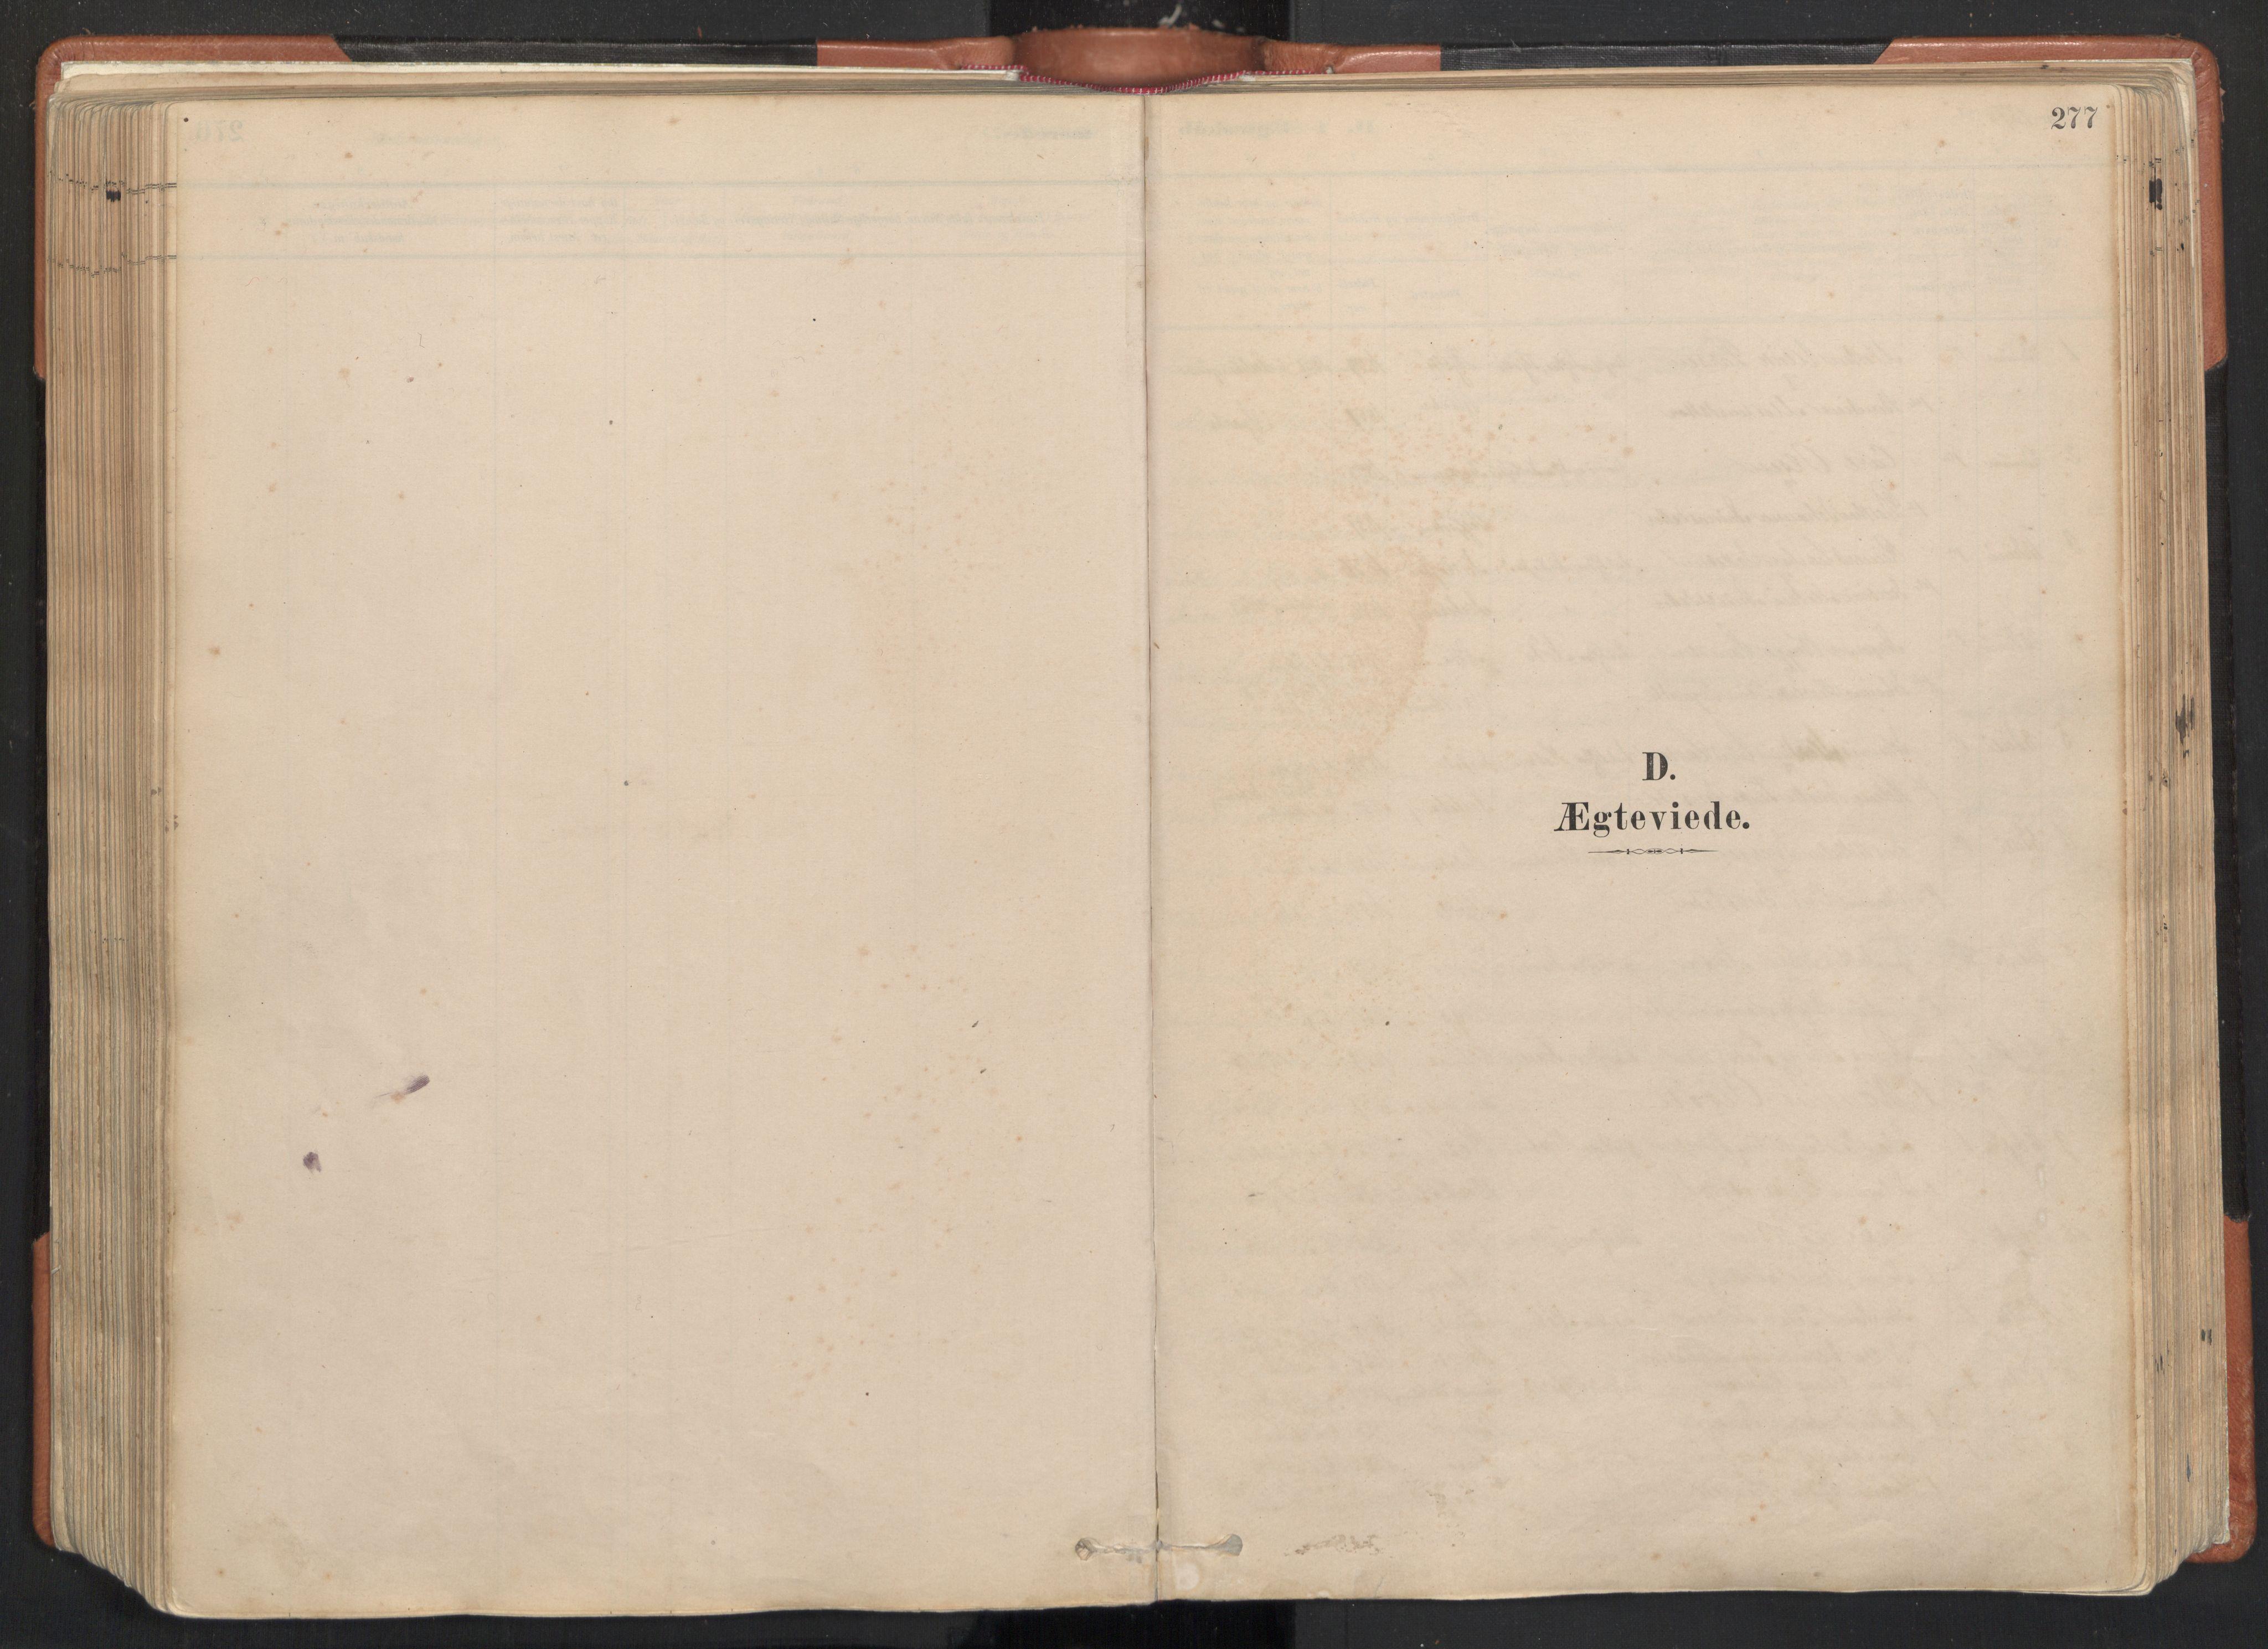 SAT, Ministerialprotokoller, klokkerbøker og fødselsregistre - Nordland, 817/L0264: Ministerialbok nr. 817A04, 1878-1907, s. 277